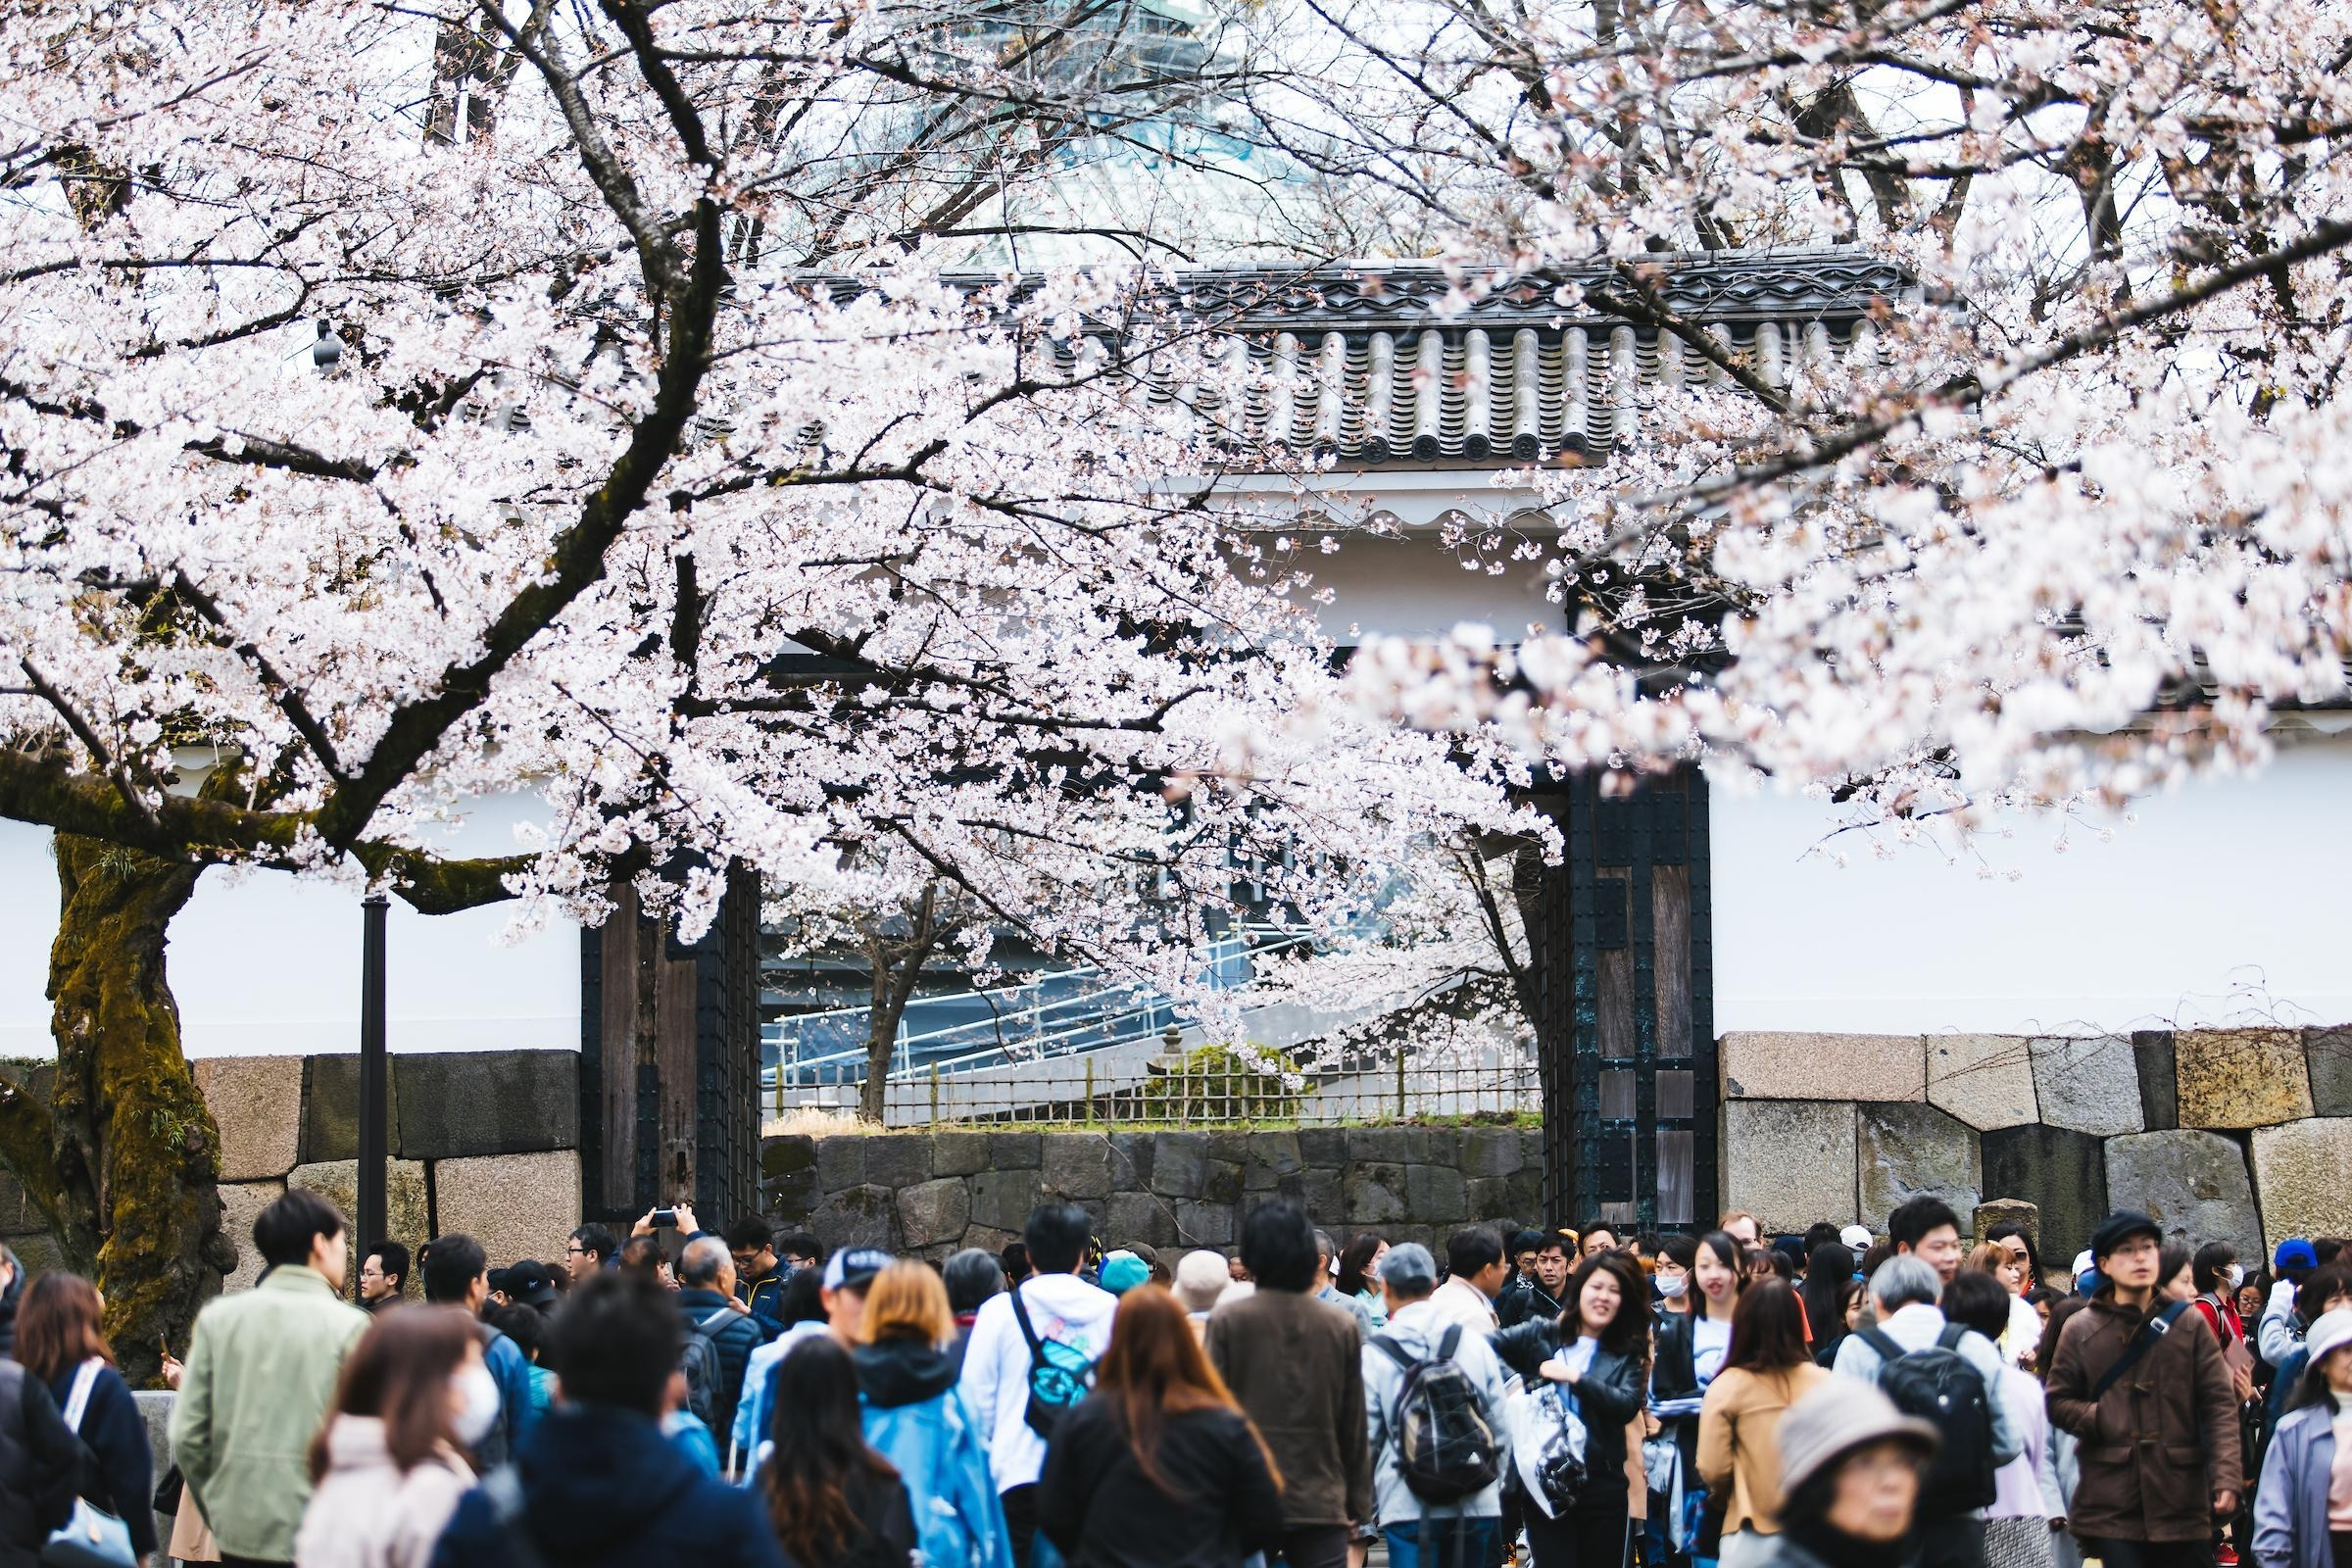 How to Experience Cherry Blossom Season in Kyoto